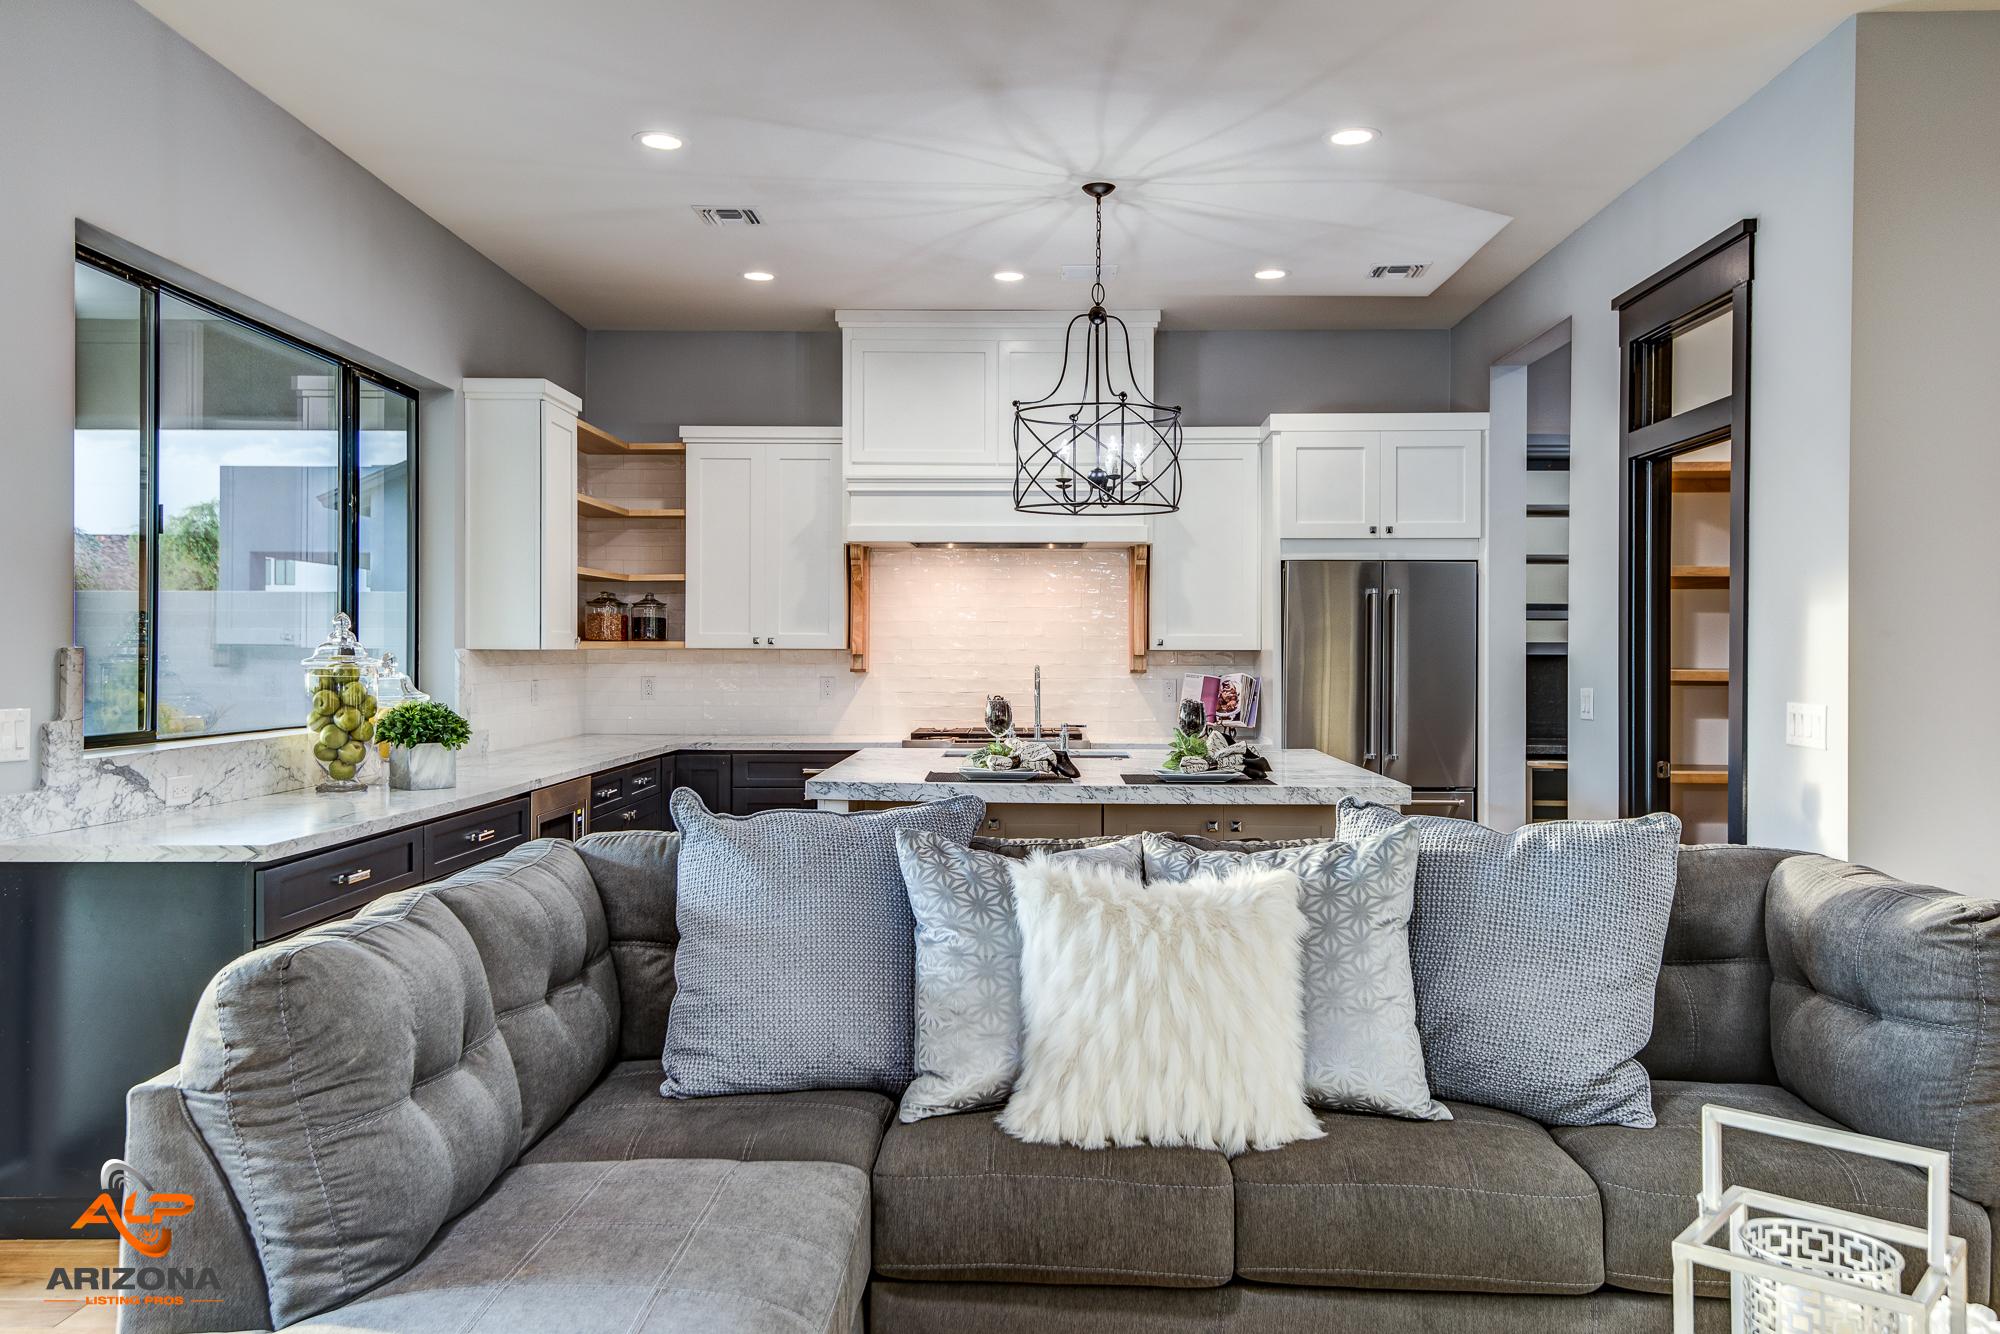 Arizona Listing Pros, Luxury Real Estate Photography, Arcadia, Arizona, 4428 North 38th Street, Phoenix, AZ.jpg